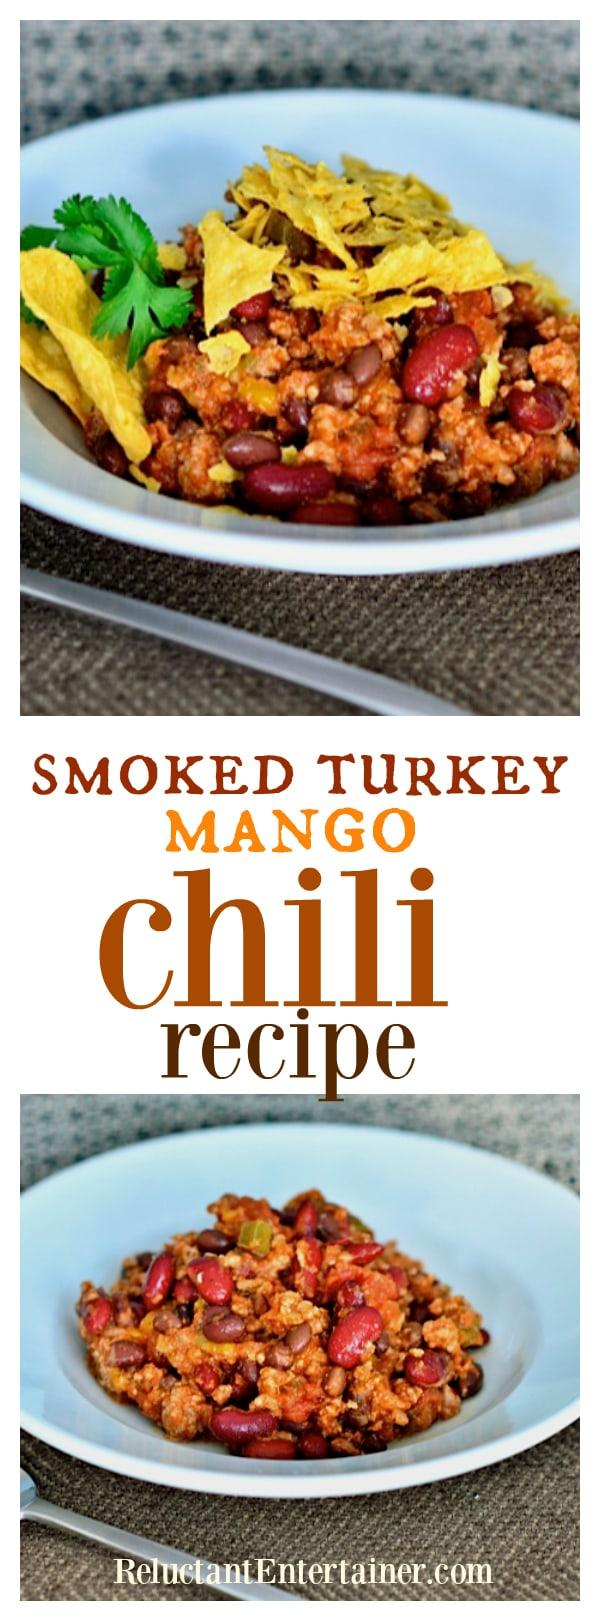 Smoked Turkey Mango Chili Recipe